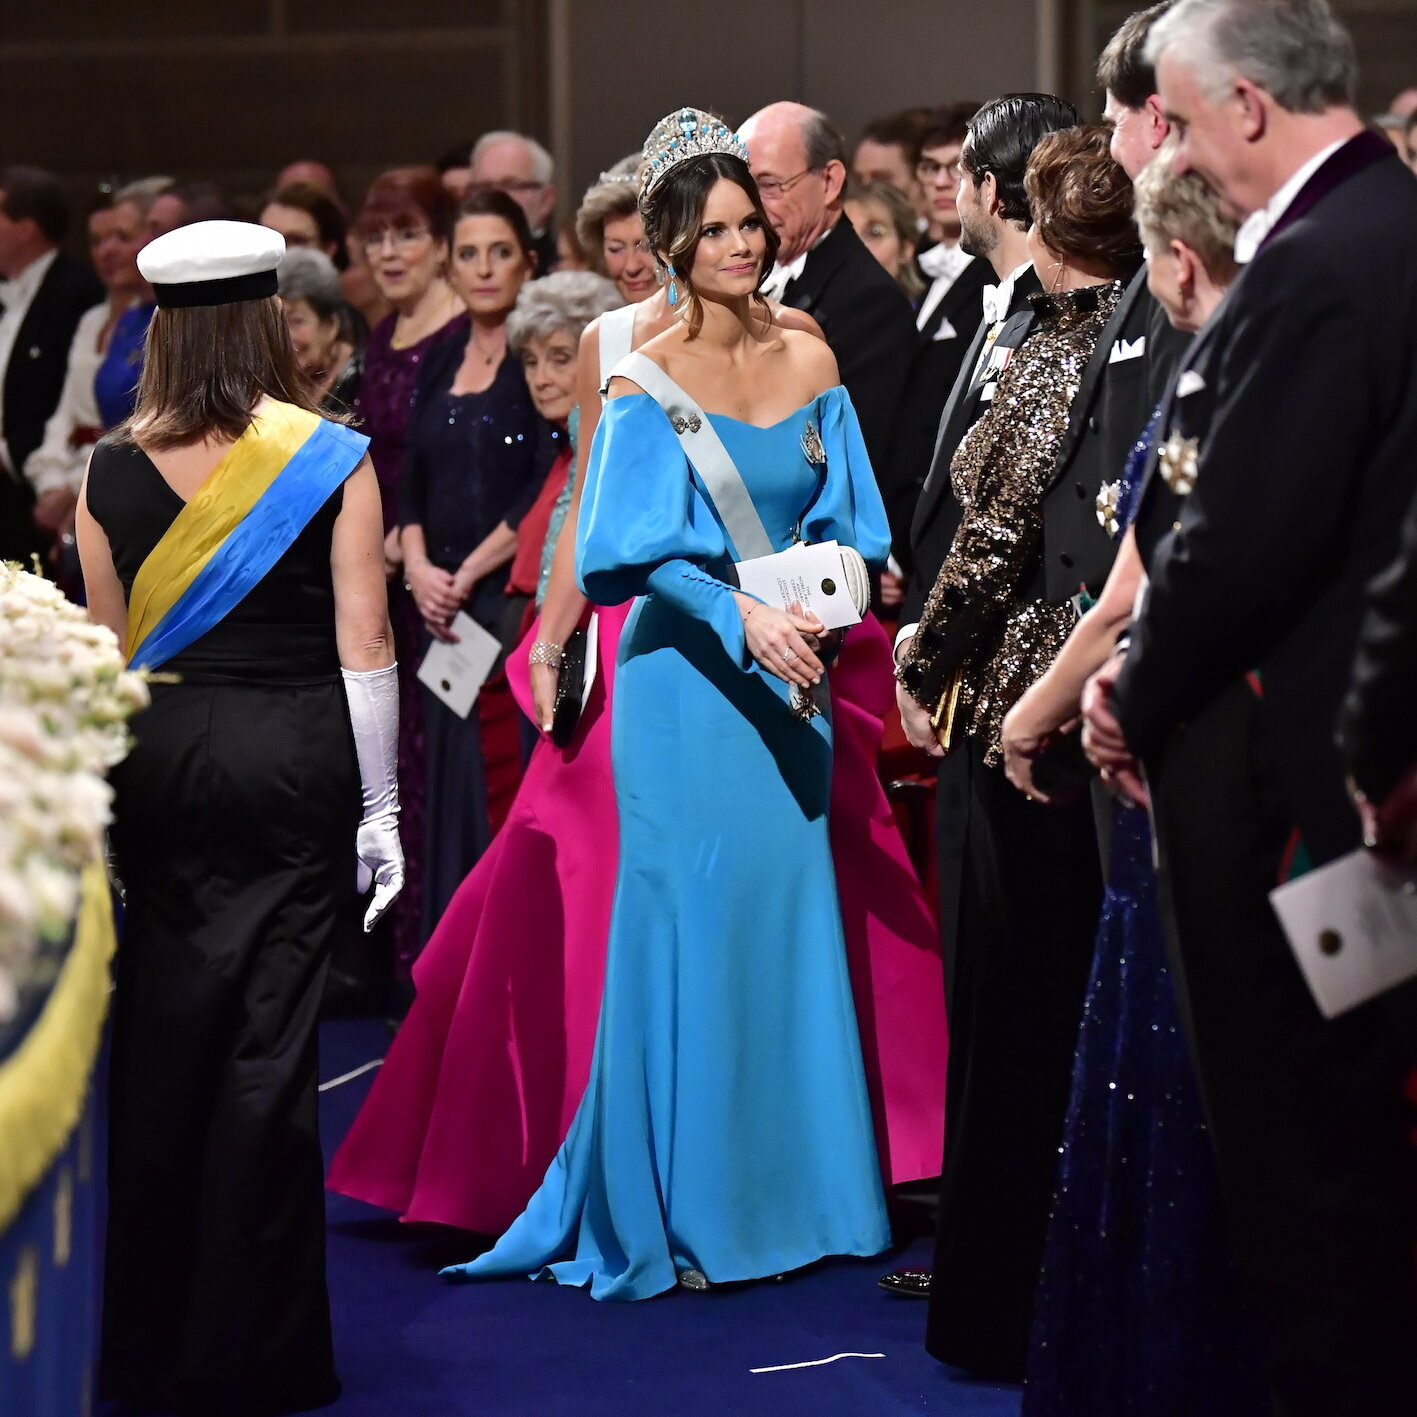 friedensnobelpreis verleihung 2019